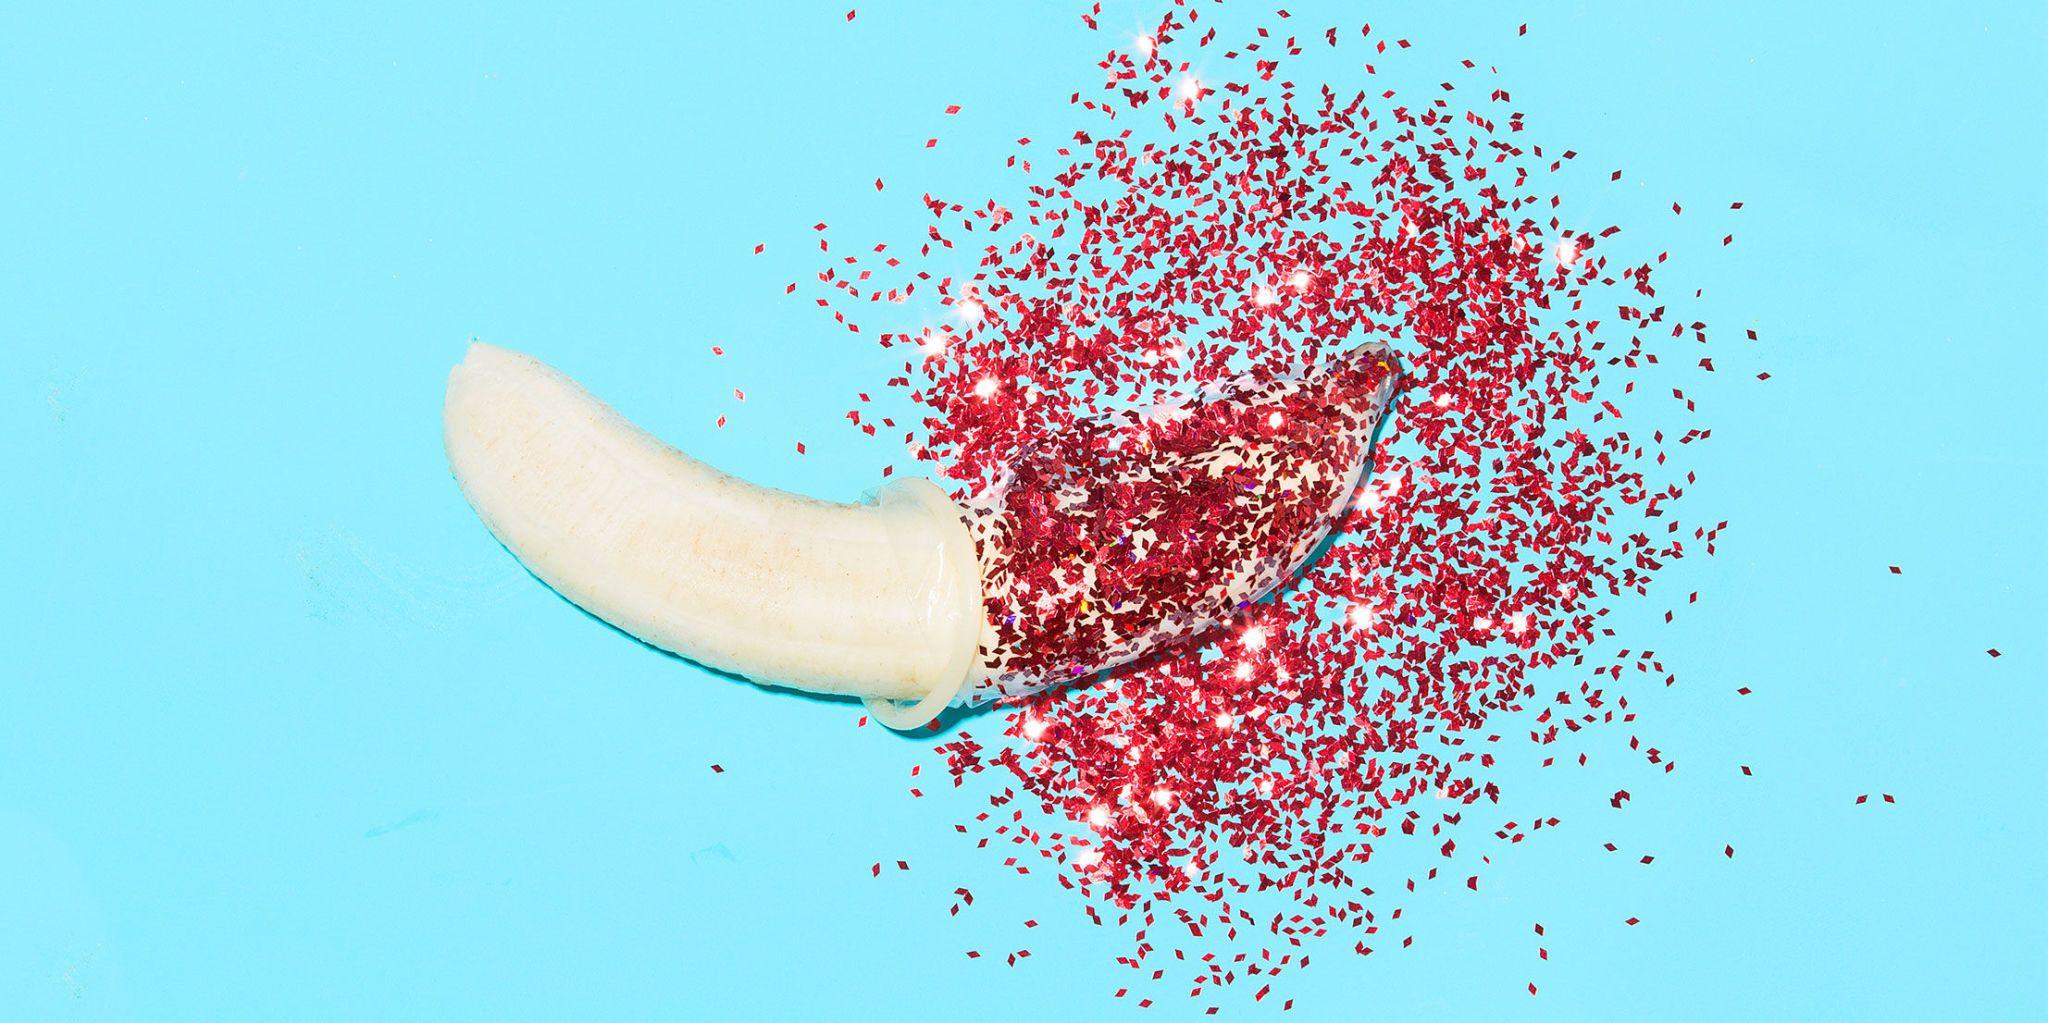 Periods wali days ki nude pics